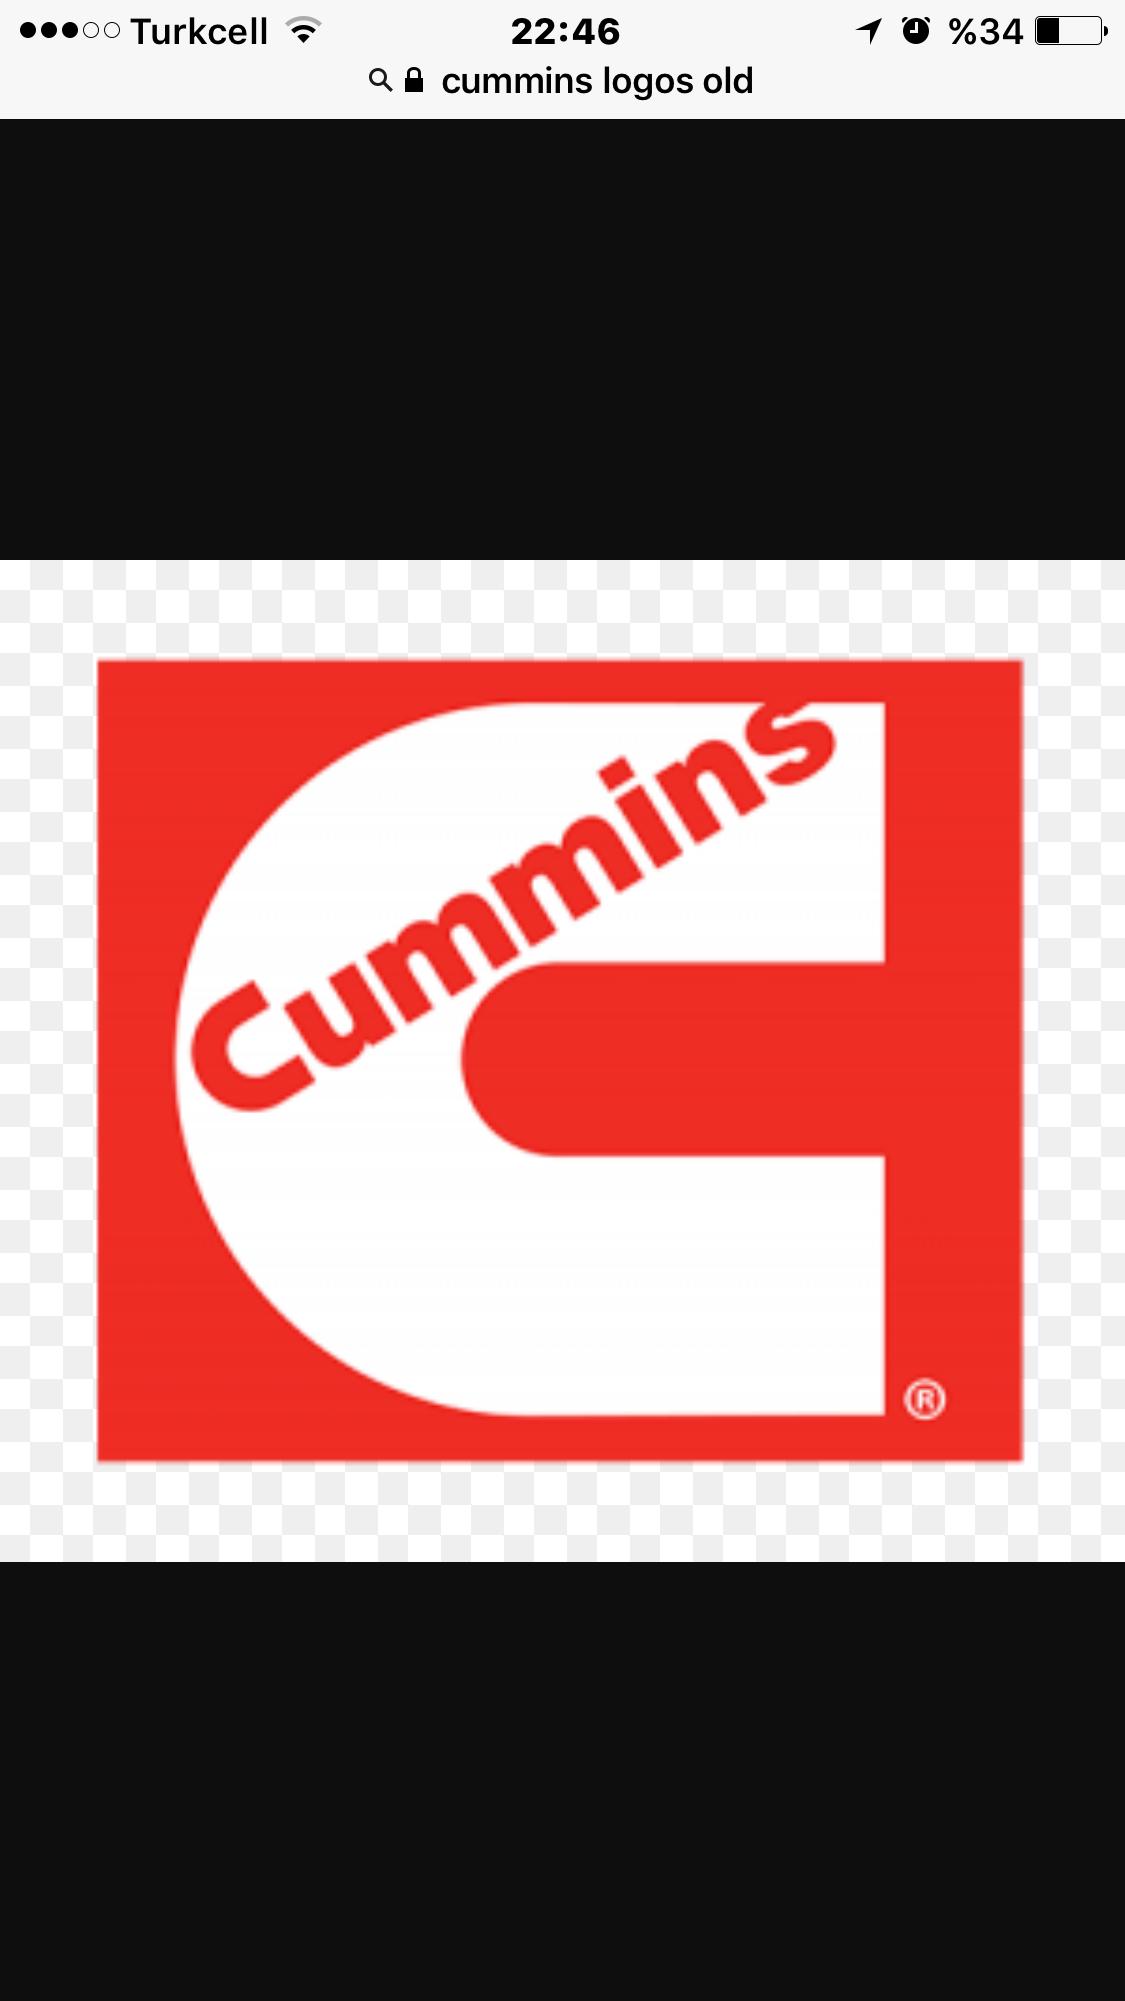 Pin By Aytuglu On Cummins Logos Old Logo Cummins Parts Cummins